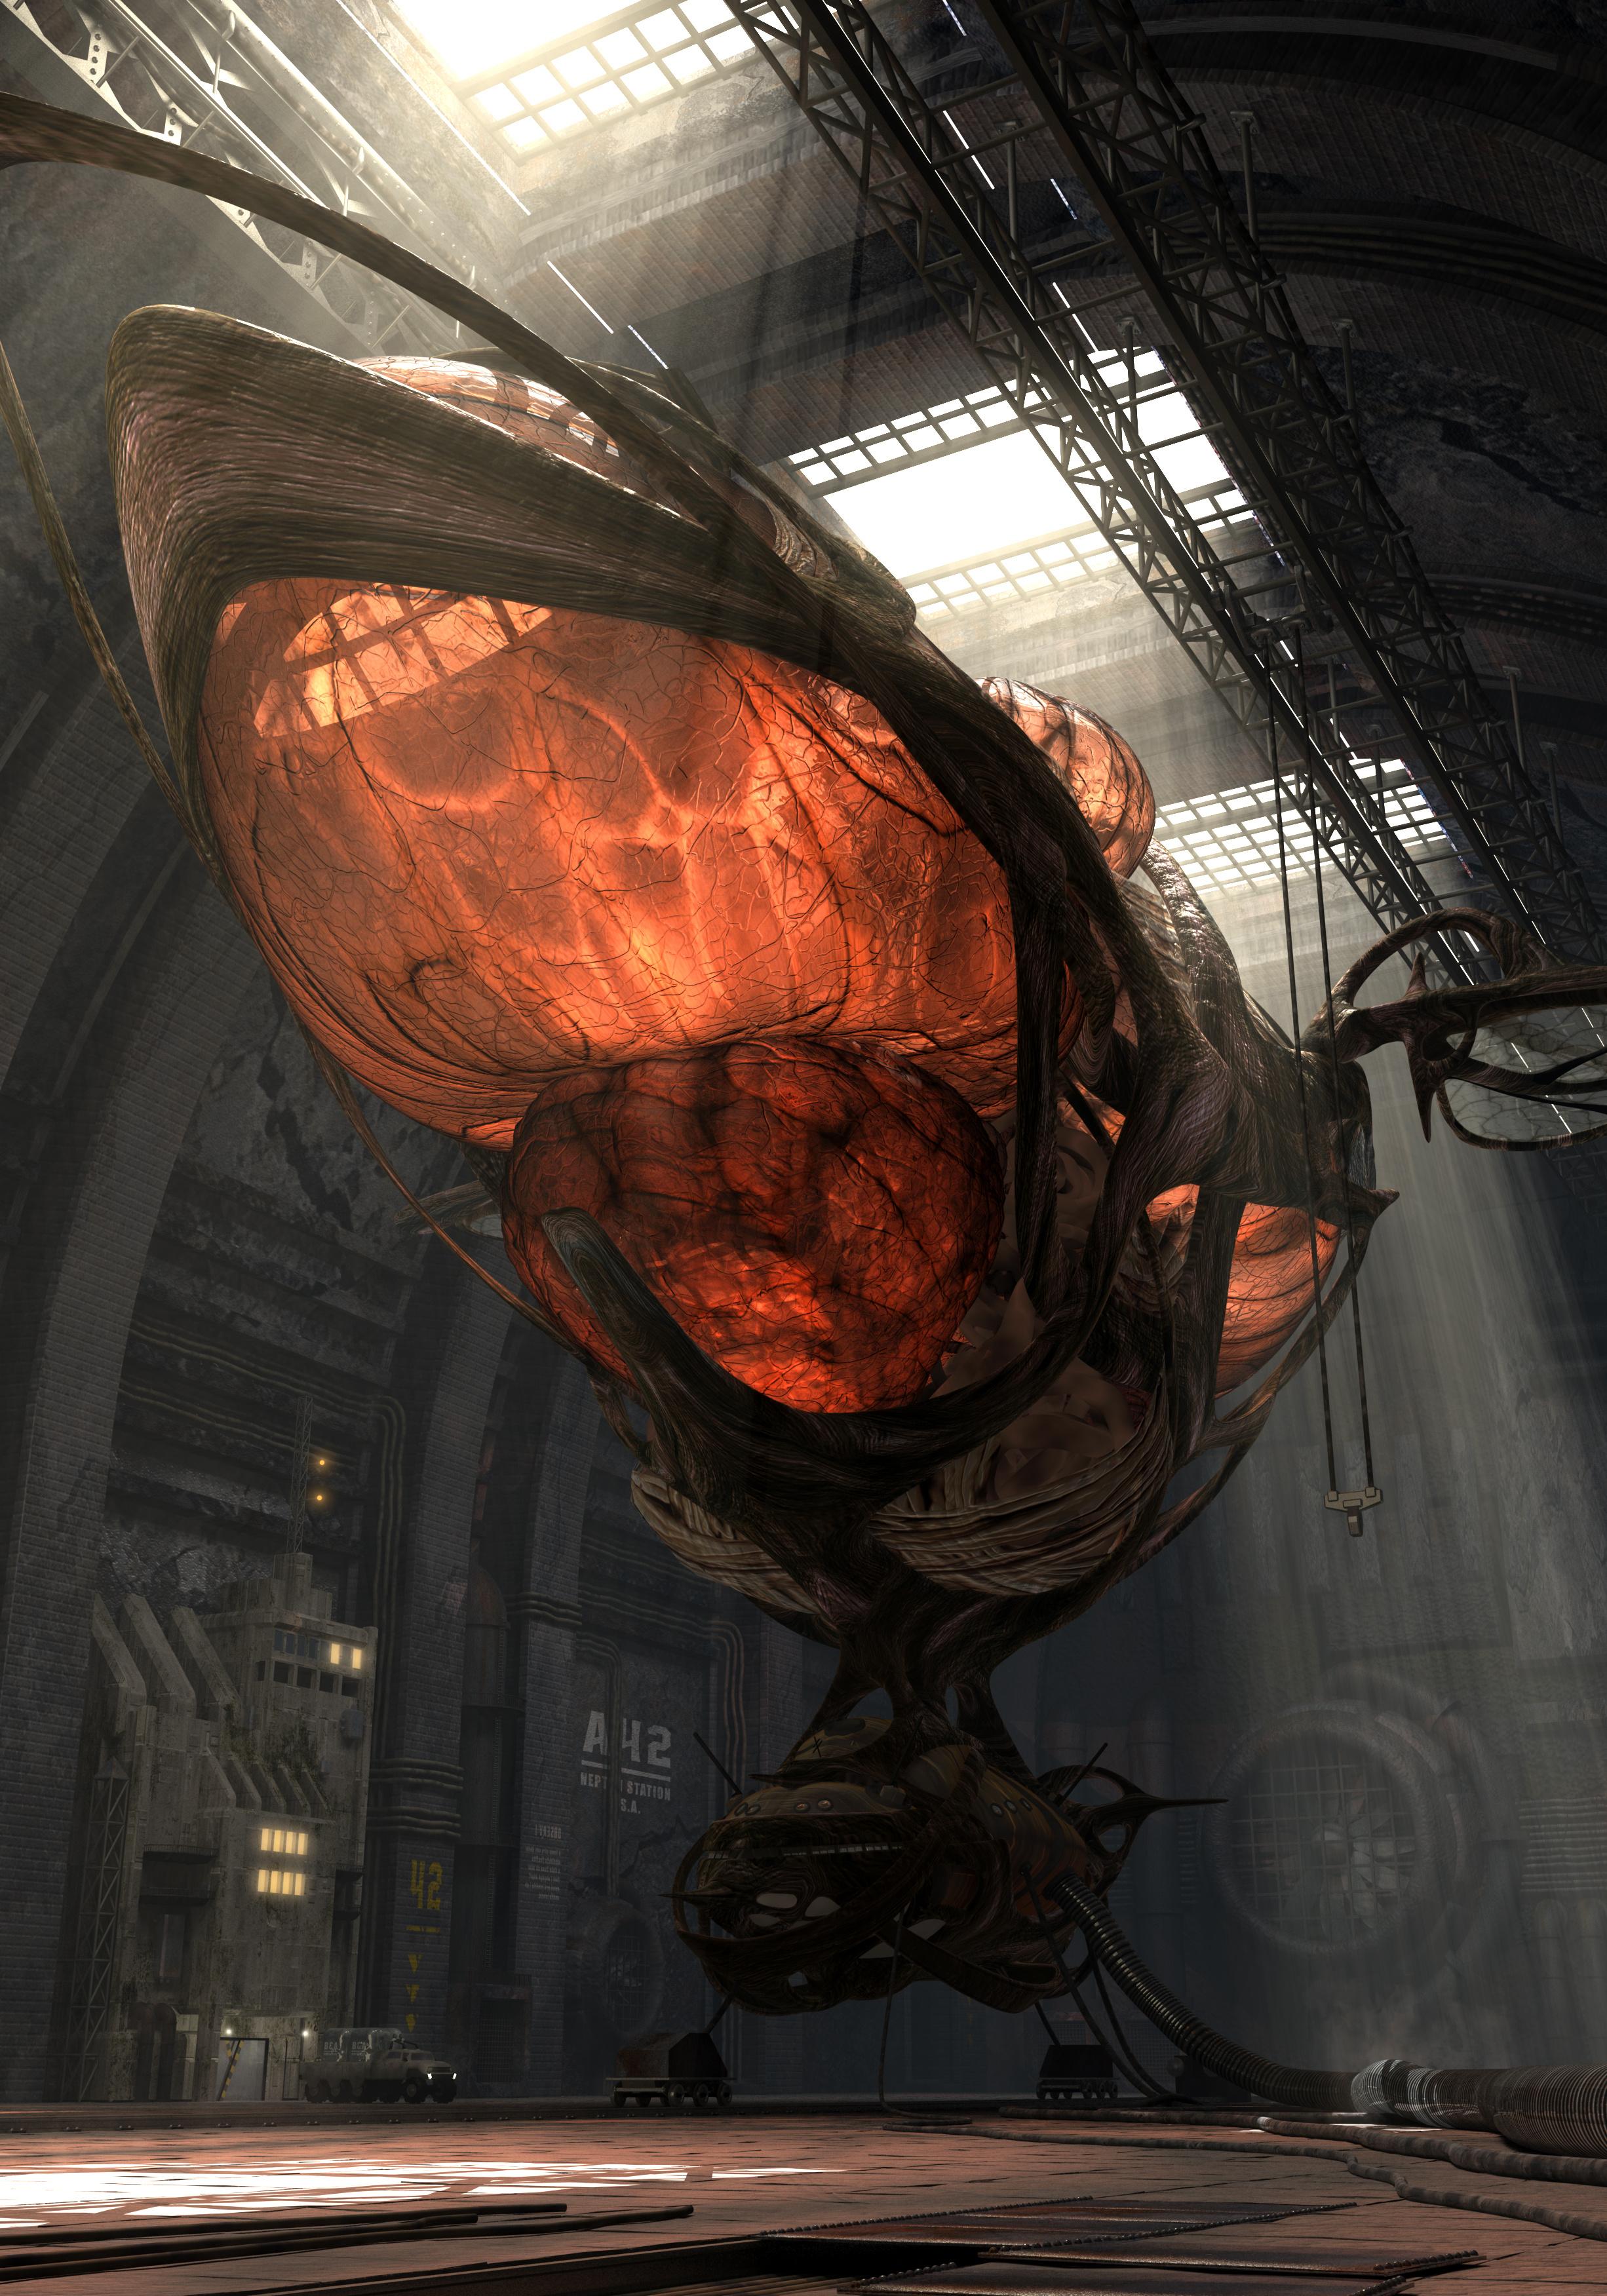 3D fantasy organic airship in the hangar